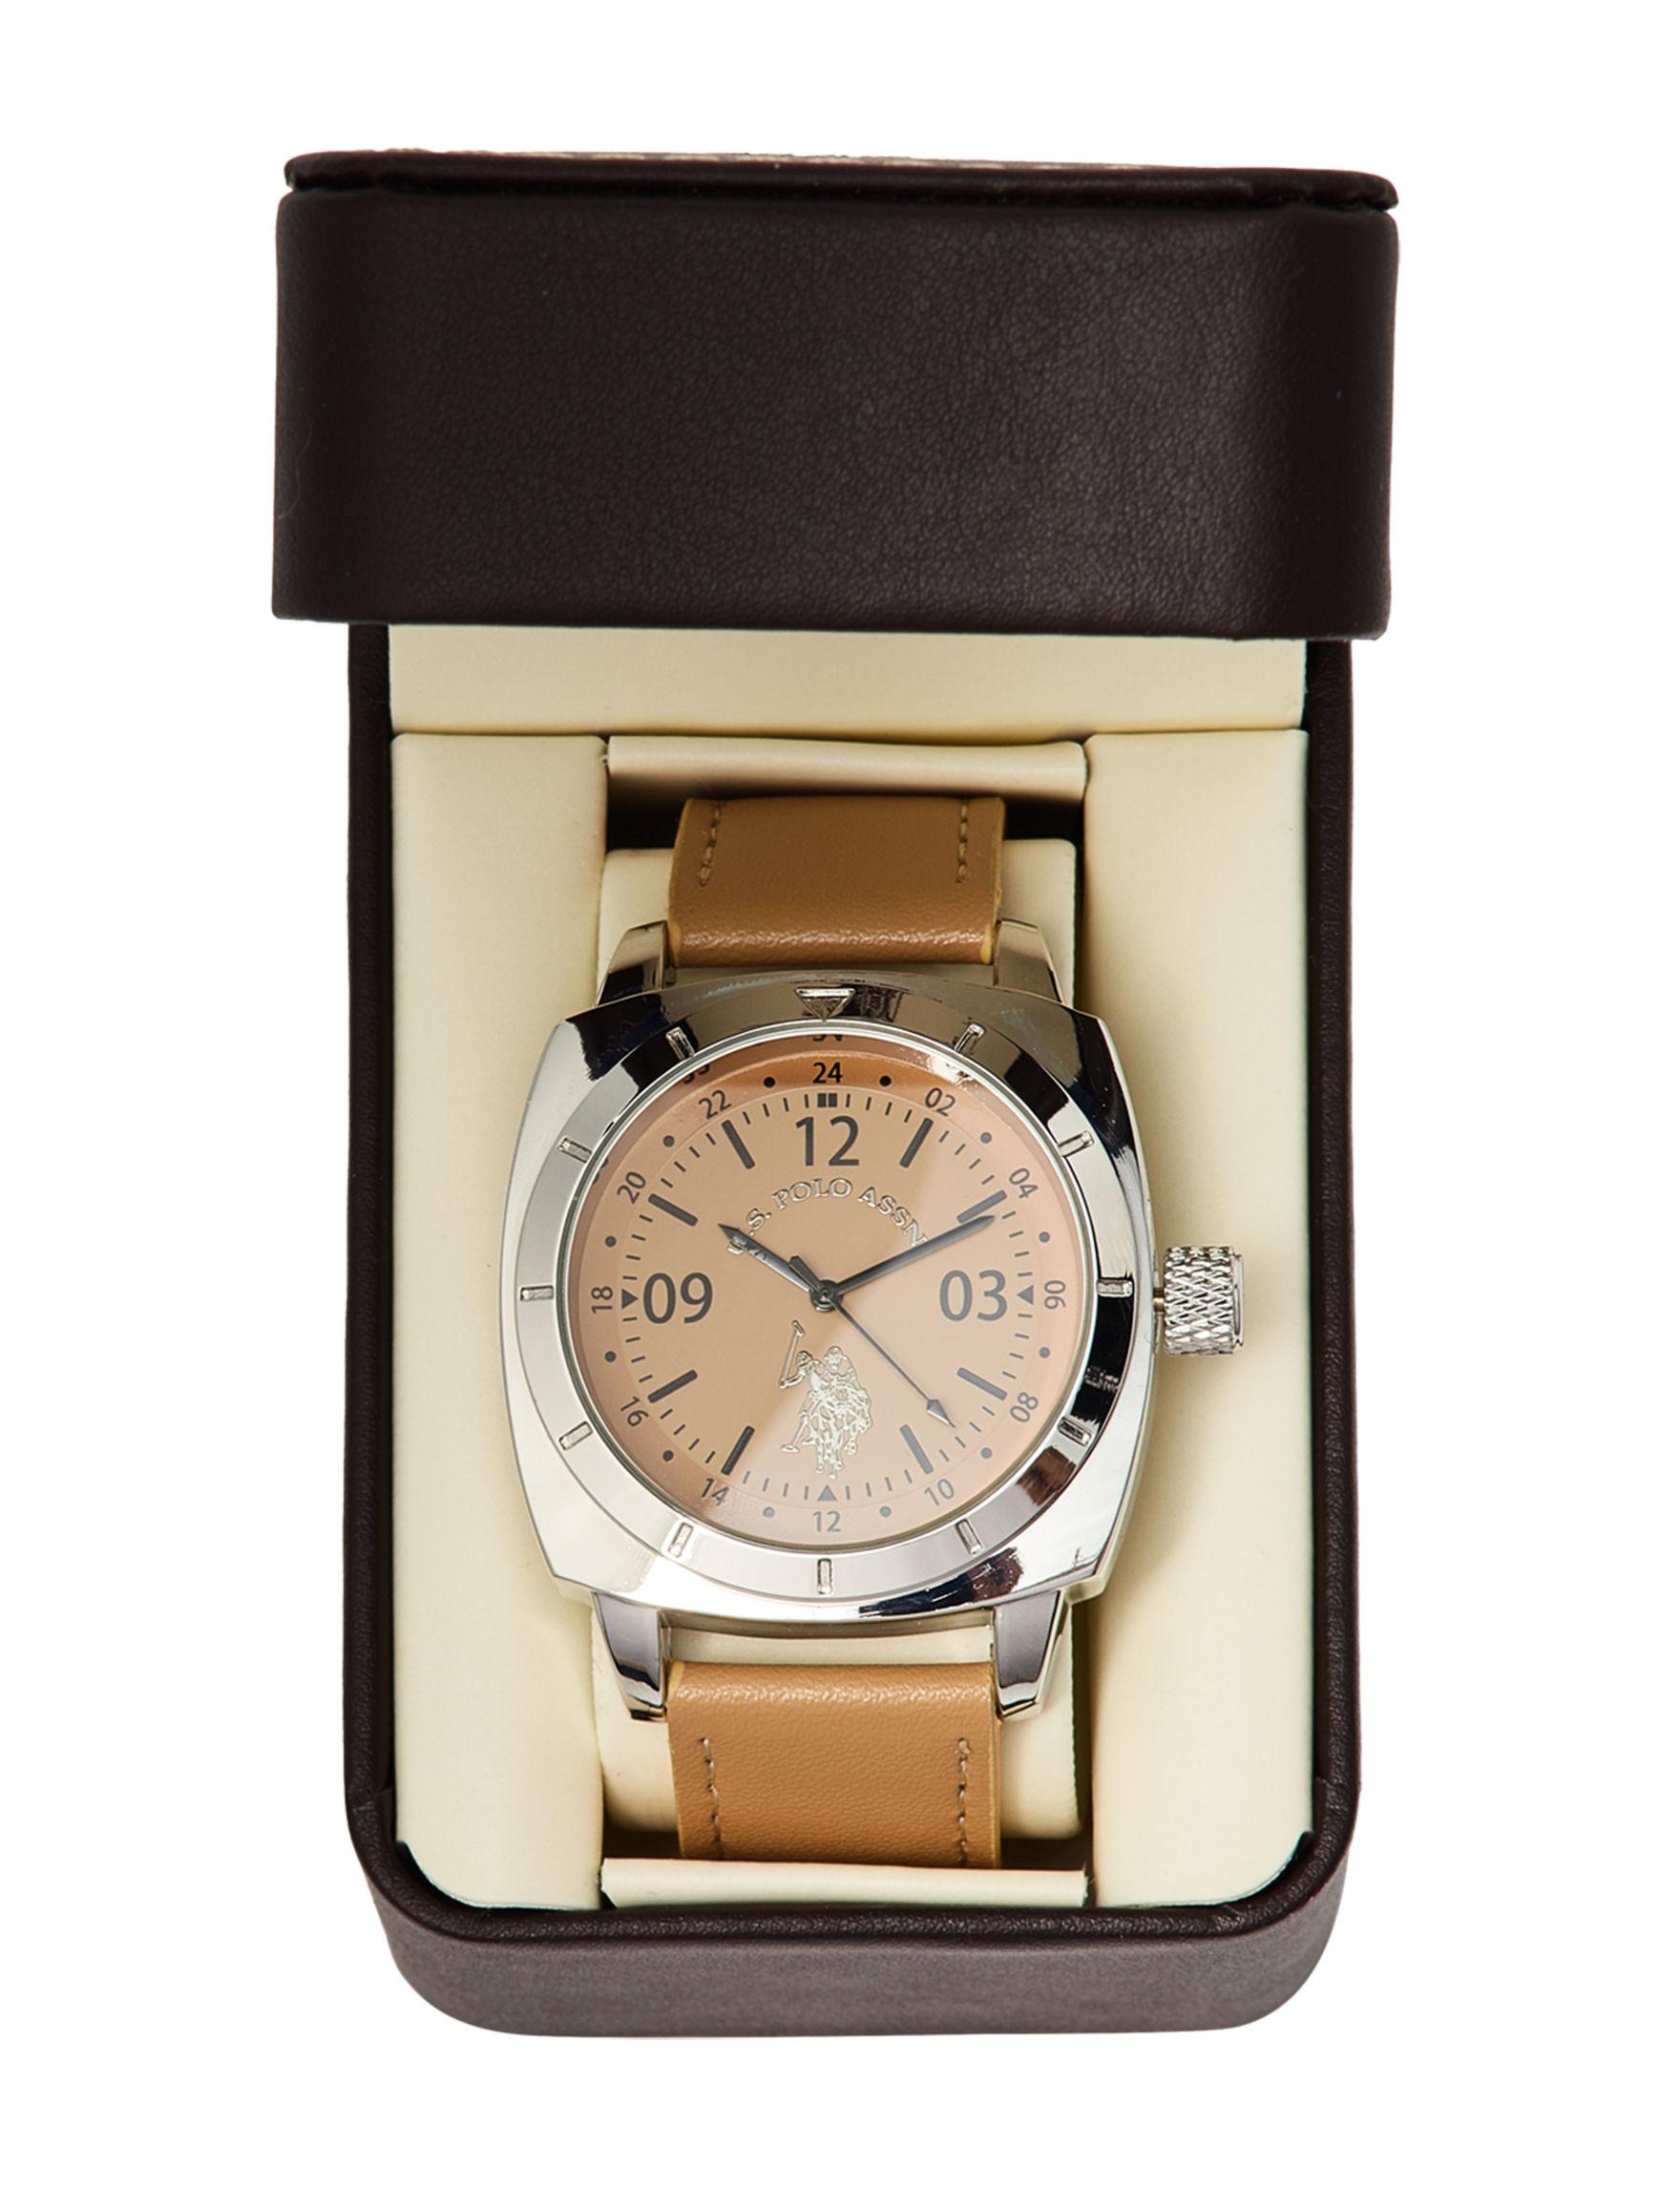 U.S. Polo Assn. Beige Fashion Watches